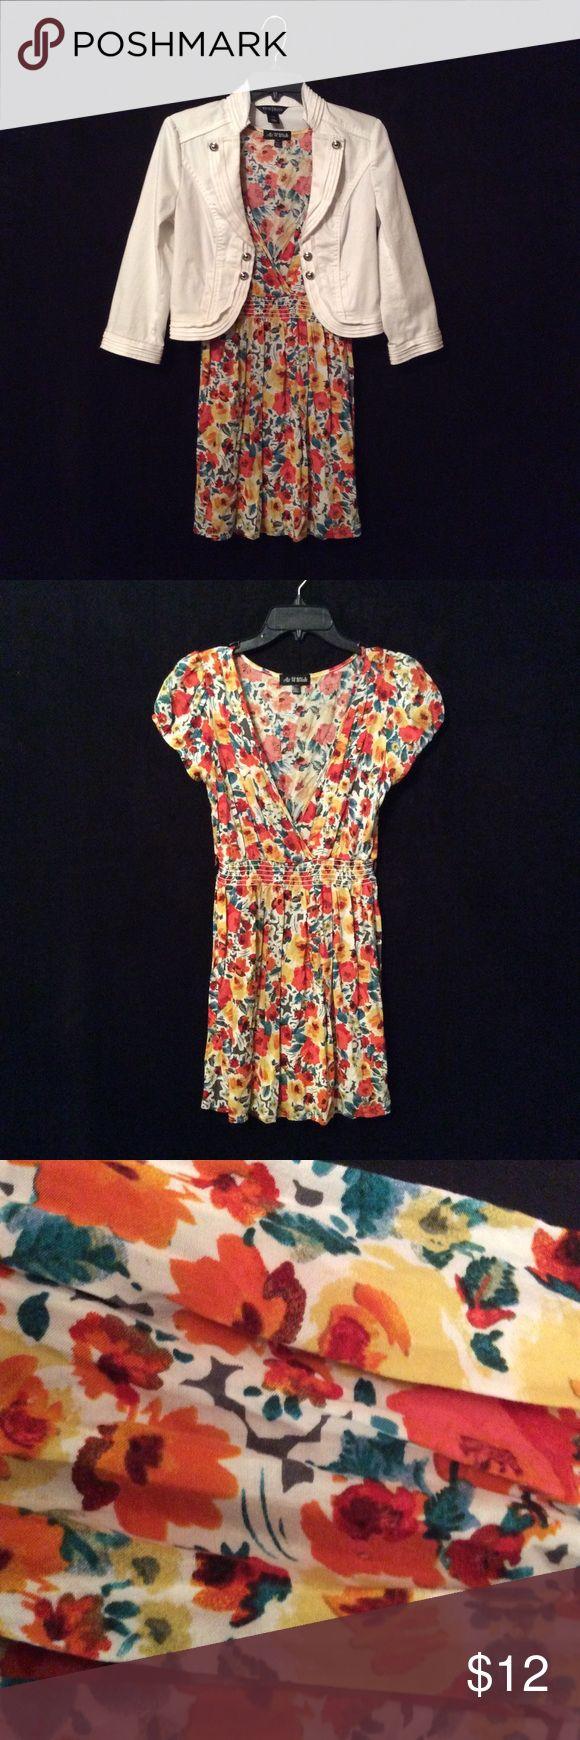 "As U Wish floral print dress Junior size M Cute summer dress. 100% Rayon. Missing belt.  30"" from collar to hem. 17"" arm to arm. As U Wish Dresses Mini"